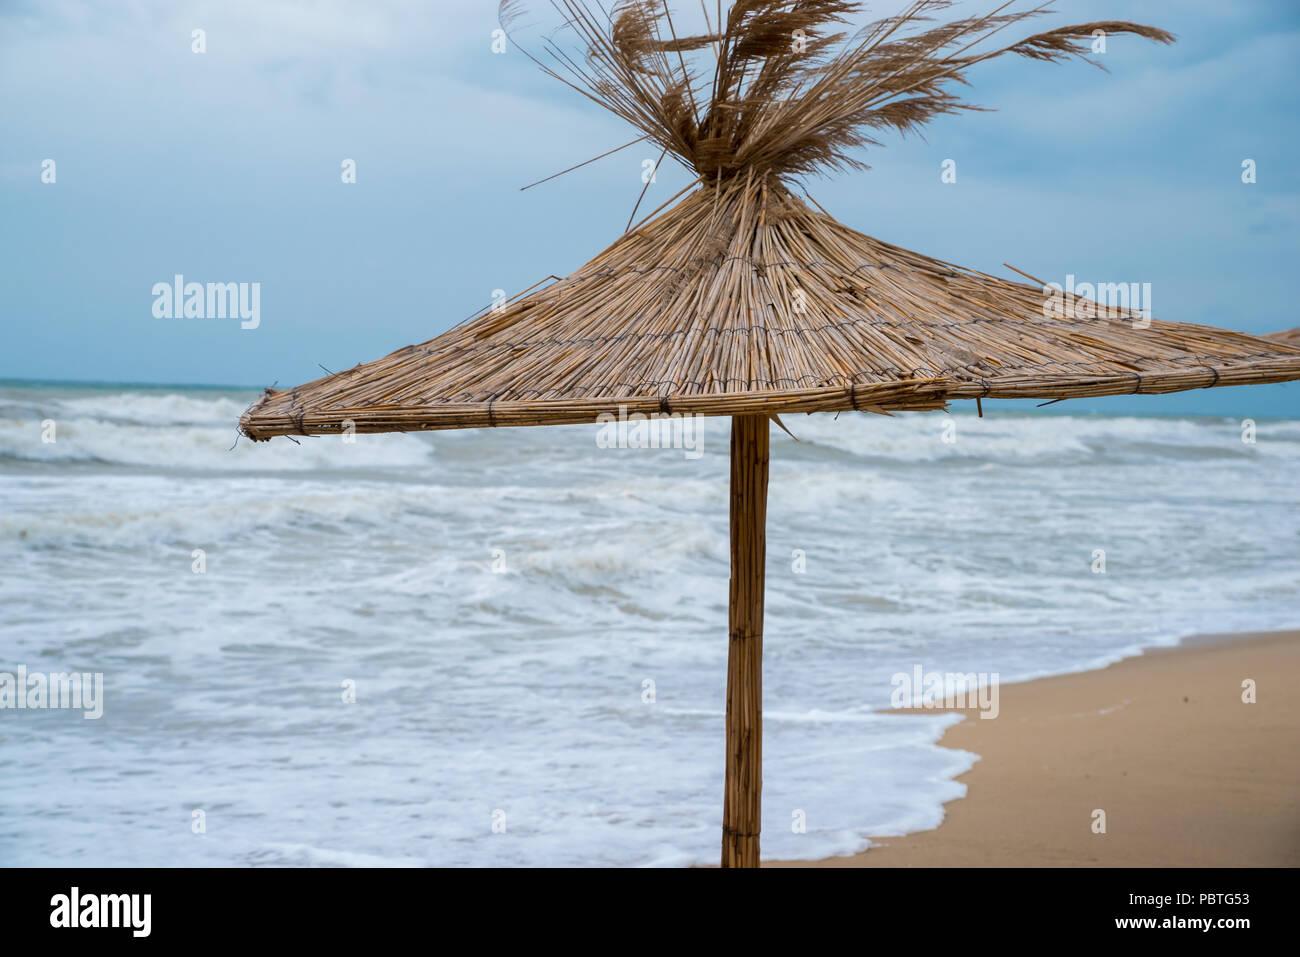 Straw umbrella on the beach. - Stock Image